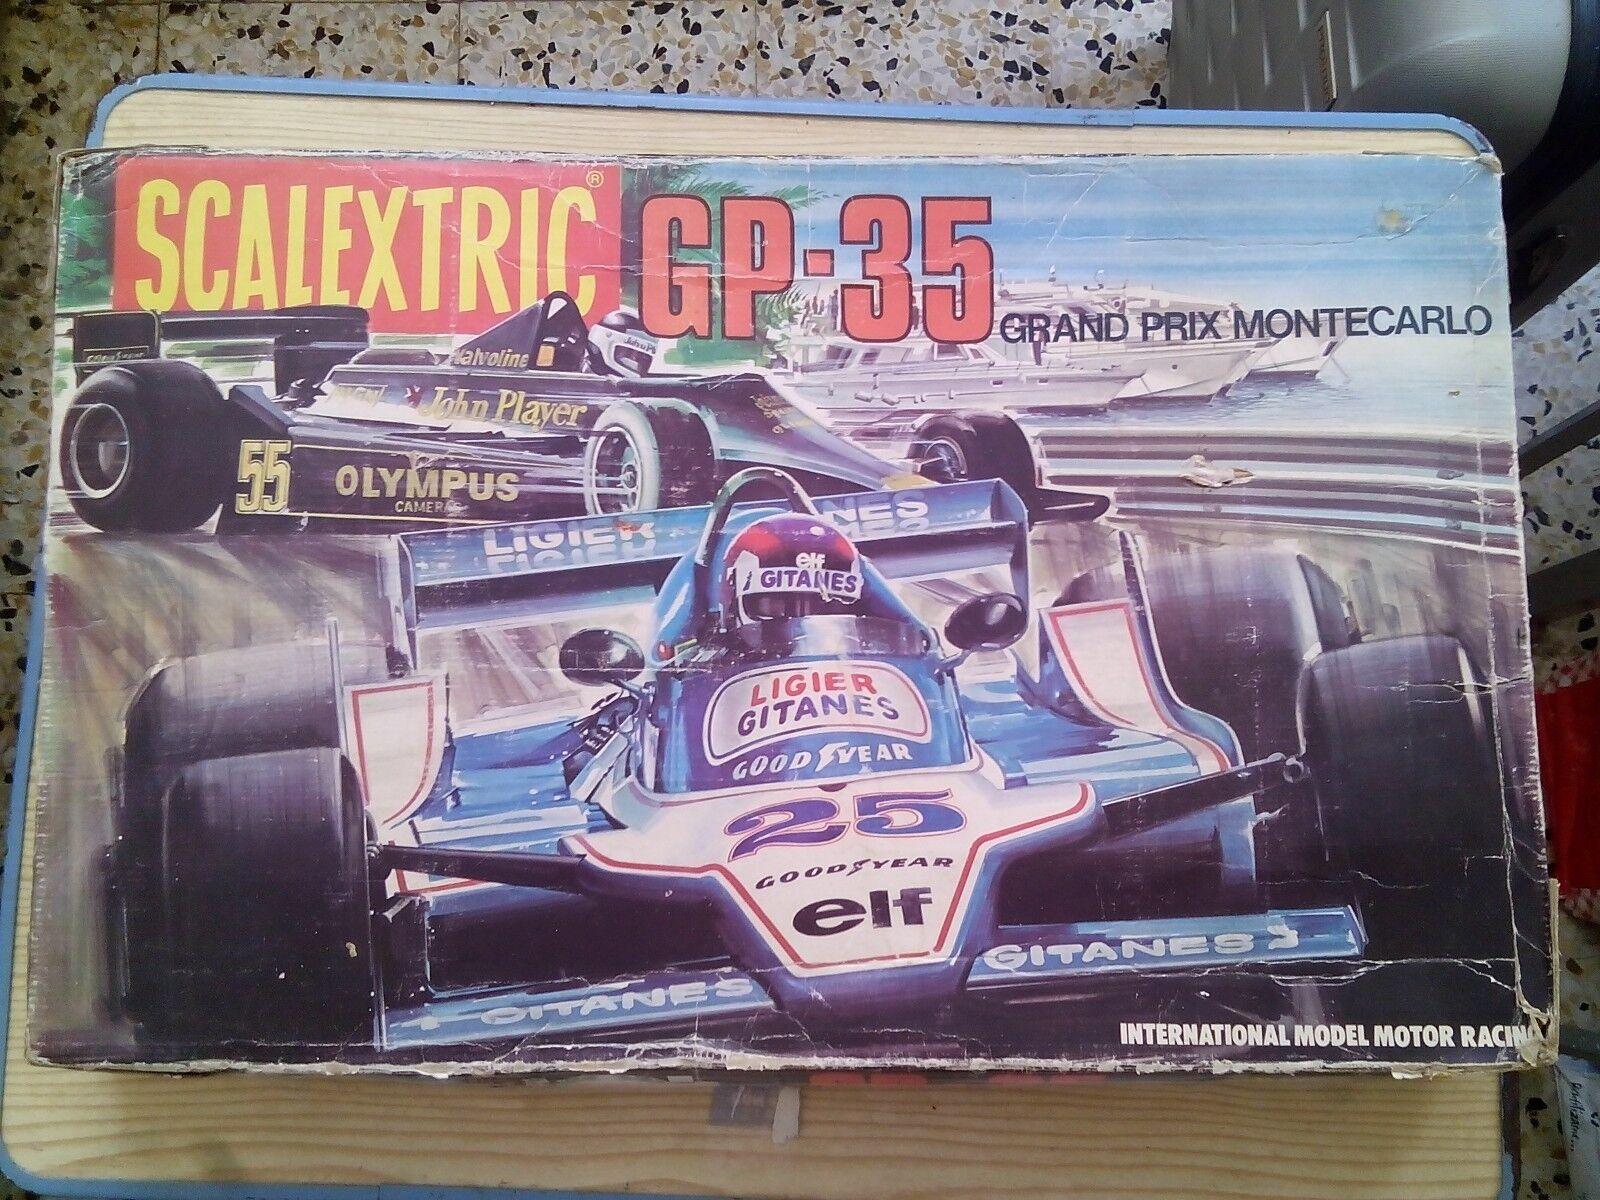 Scalextric GP-35 Grand Prix Montecarlo Con Dos Coches-Lotus JPS MK4 NegroLigier